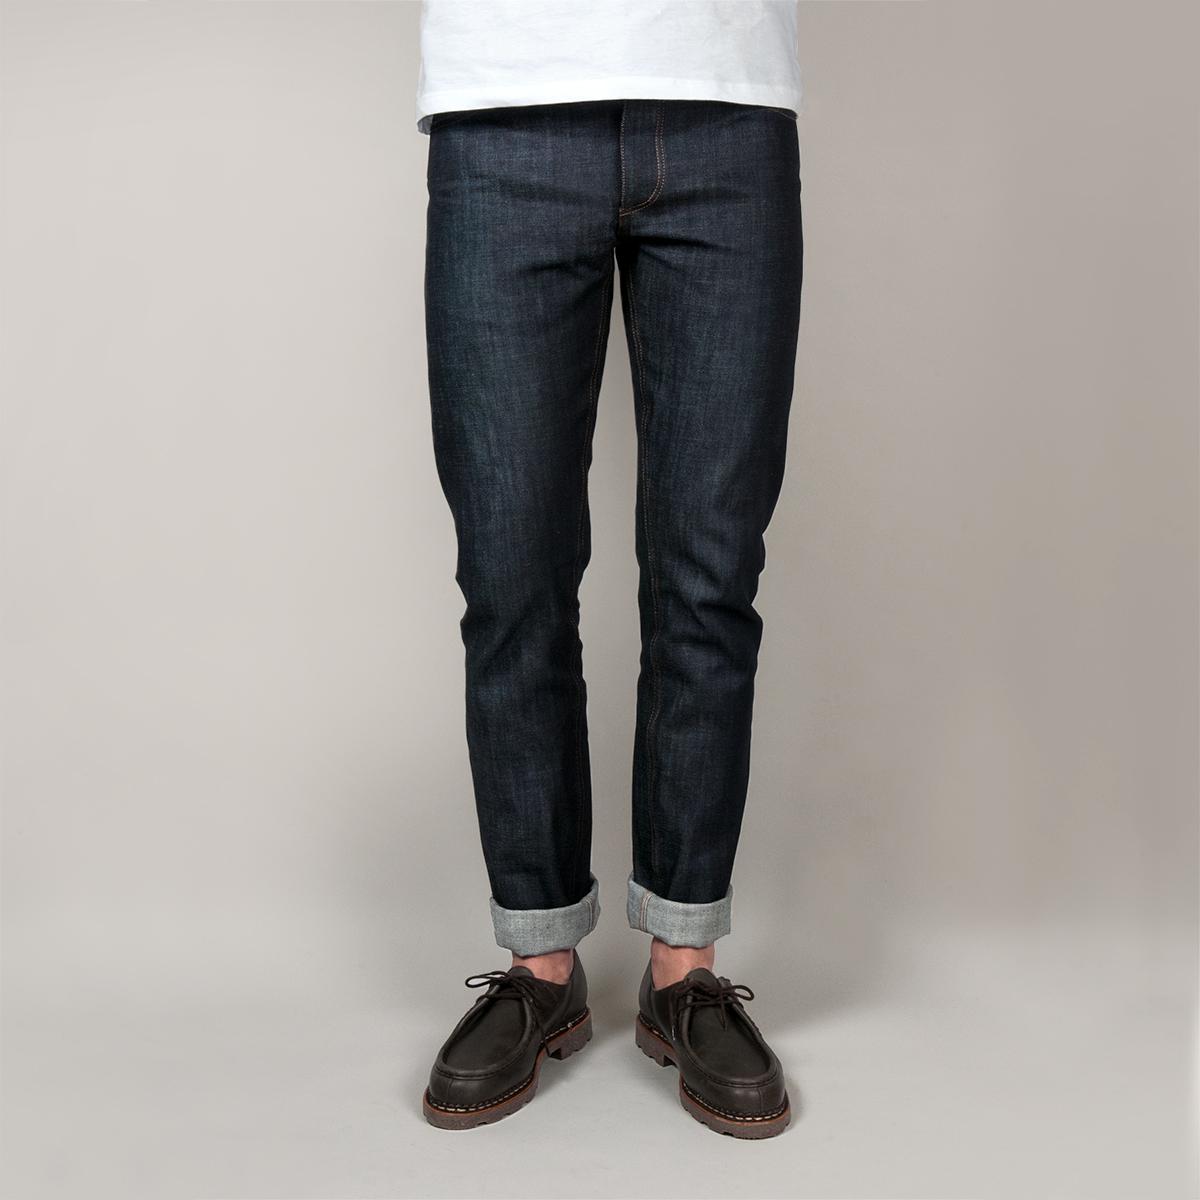 Jeans madeinfrance ajuste face